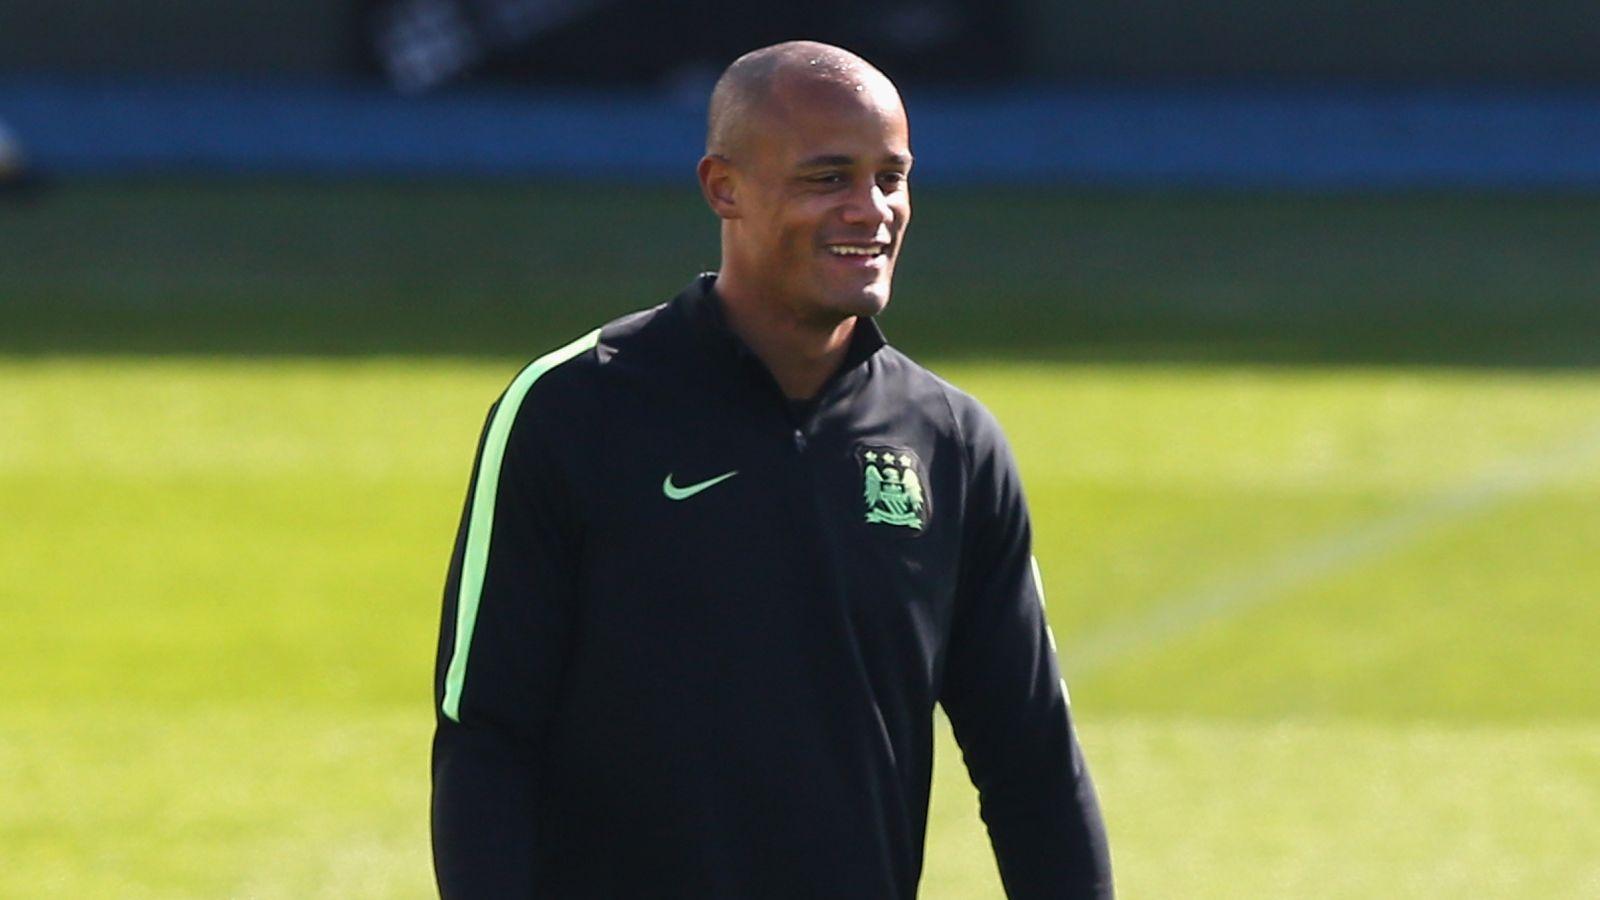 City defender Kompany not fit enough for UCL clash vs. PSG